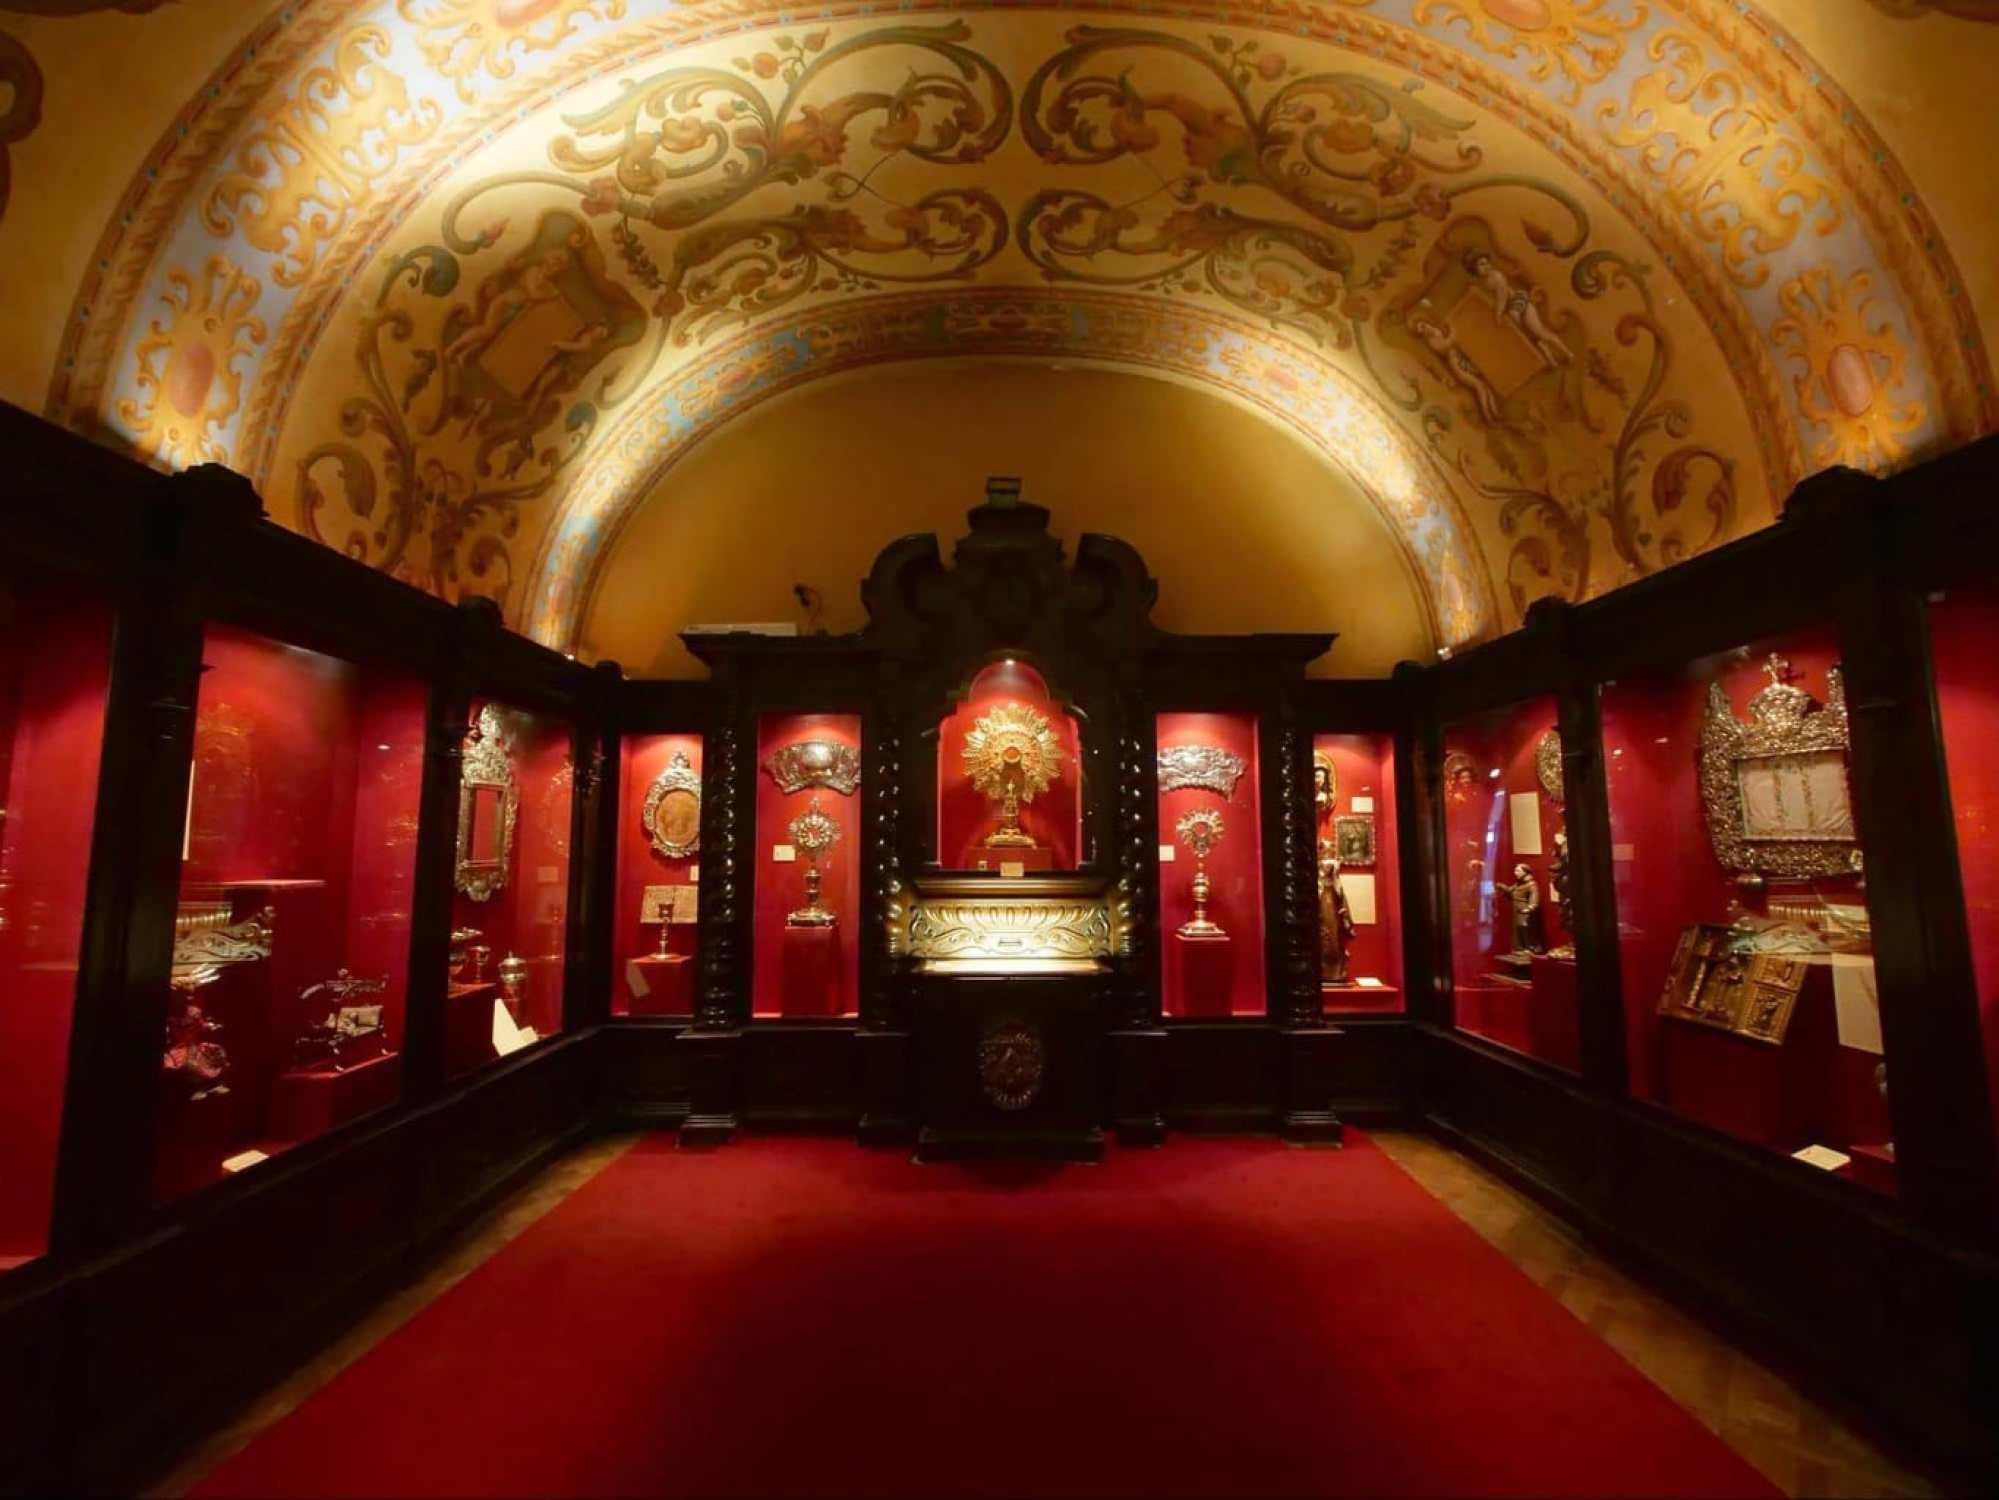 Museo de Arte Hispanoamericano Isaac Fernández Blanco interior